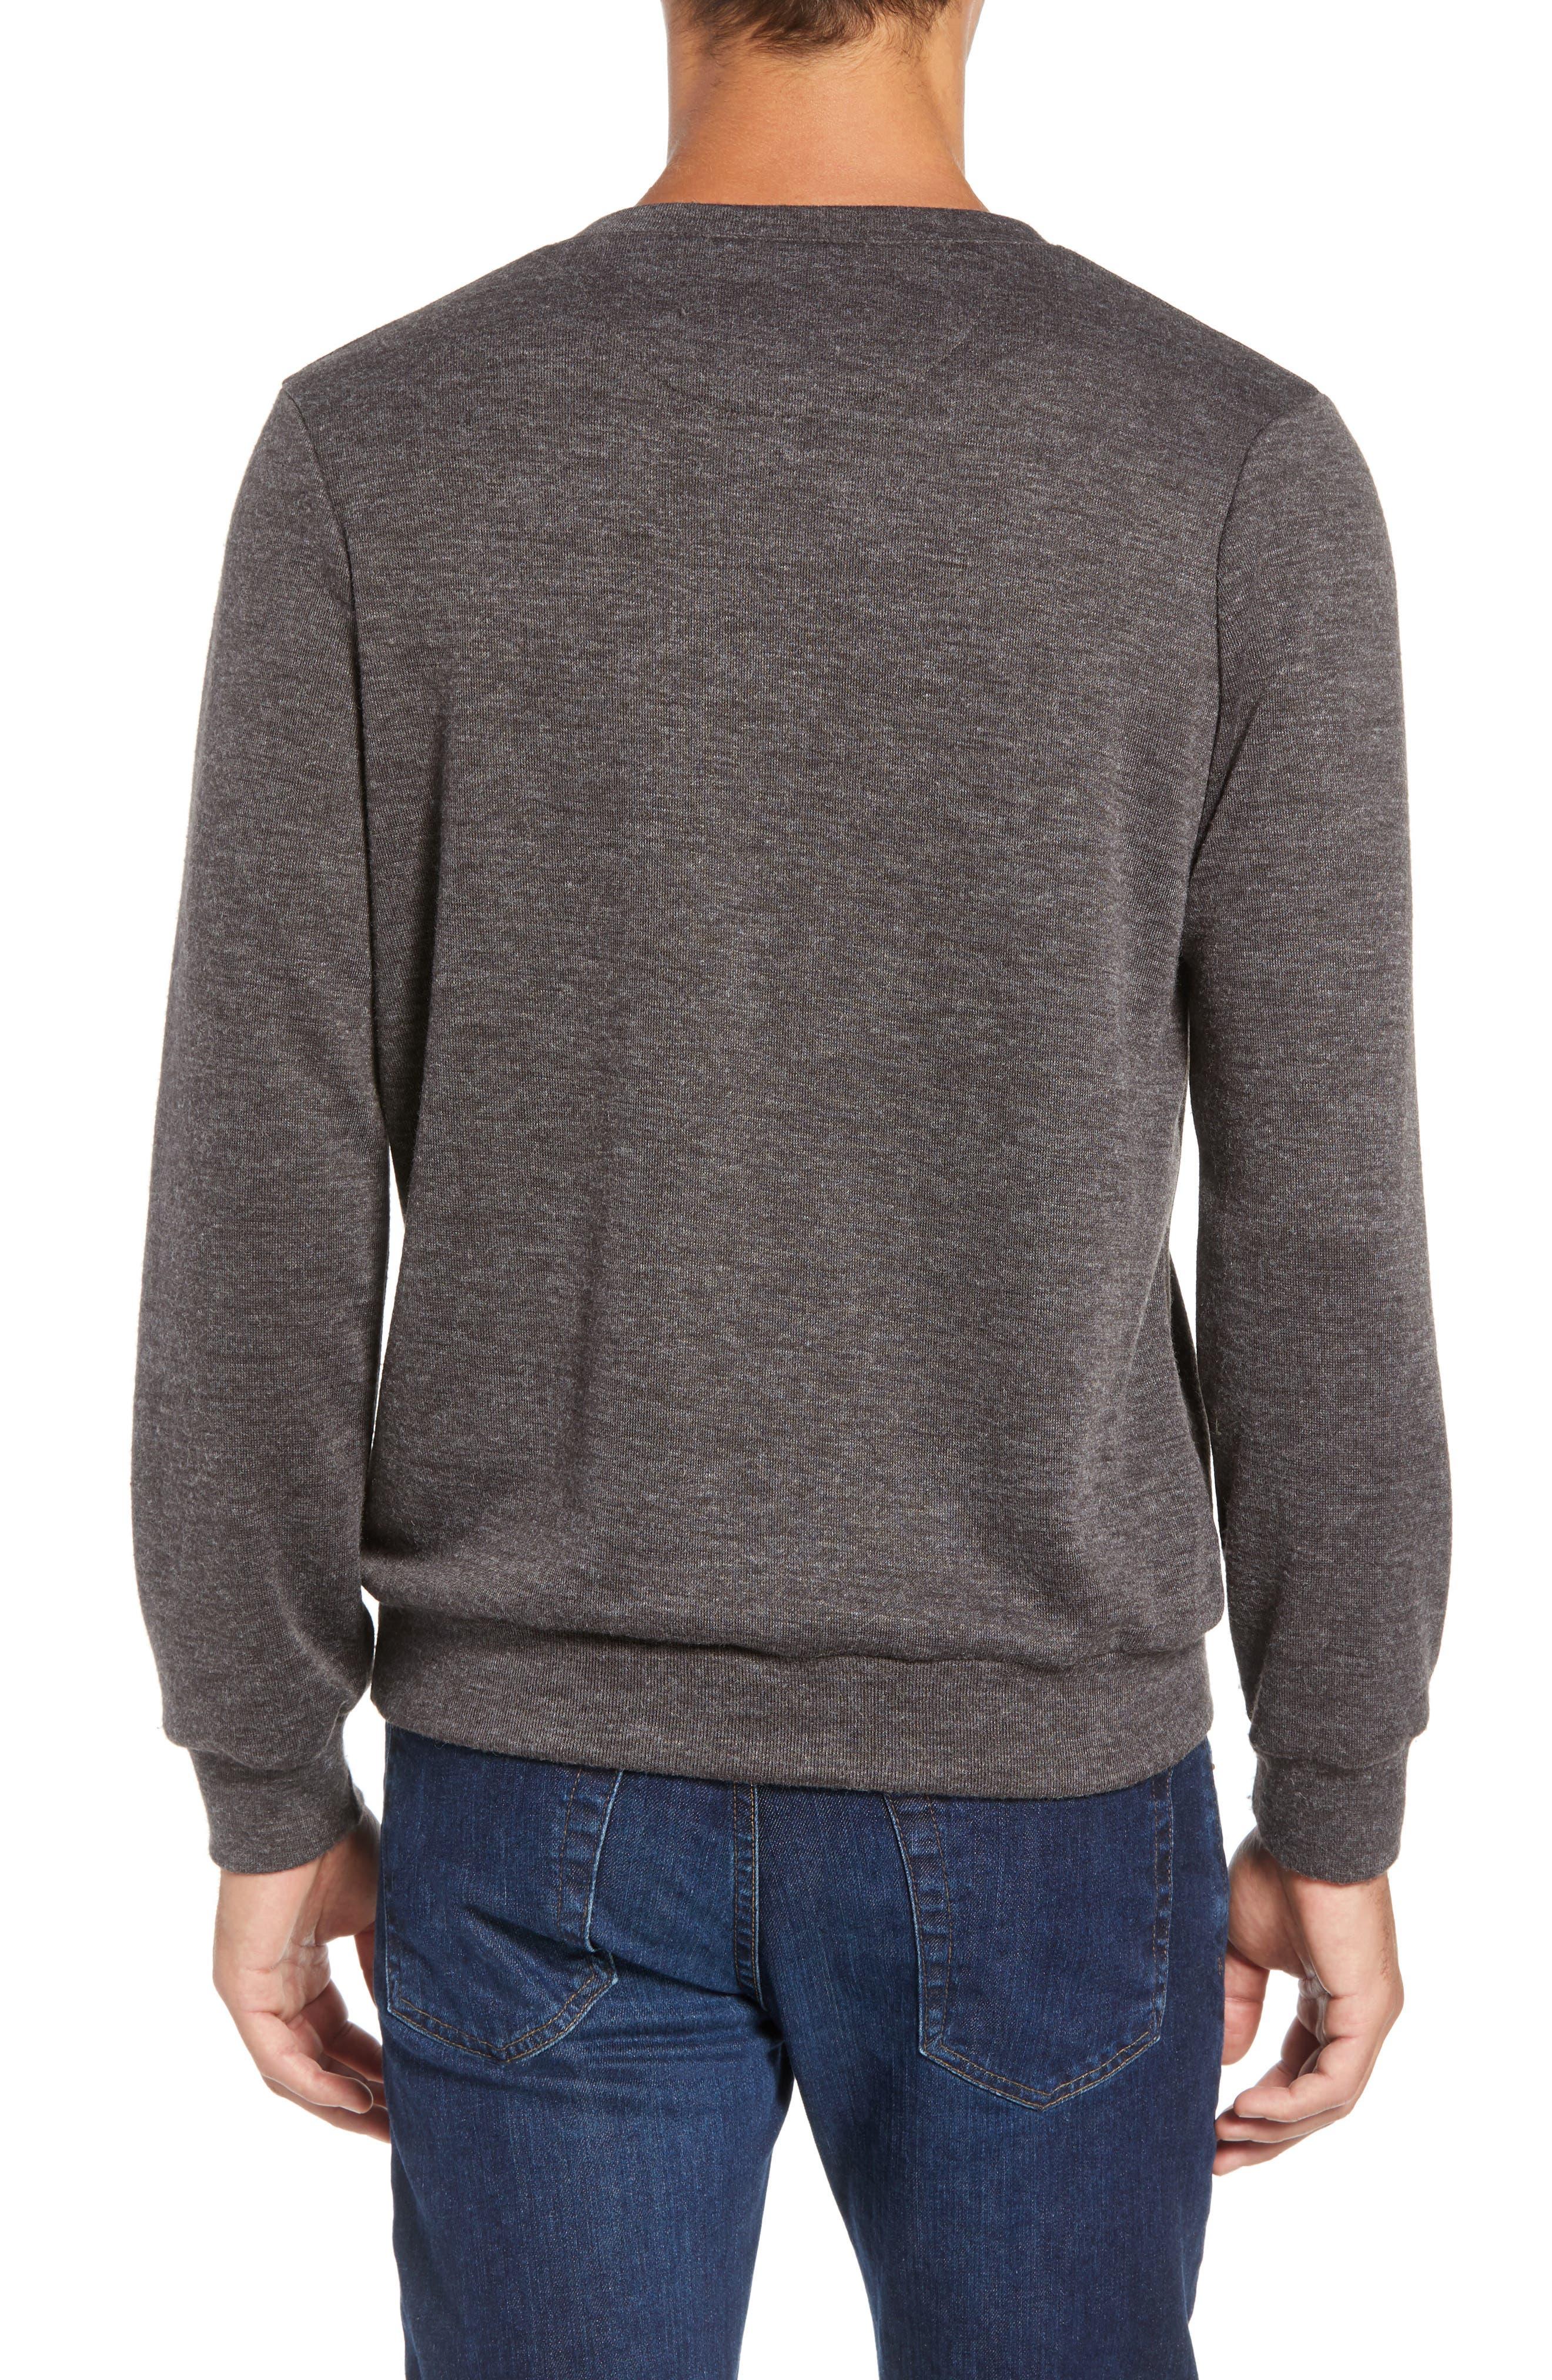 Prospect V-Neck Performance Sweater,                             Alternate thumbnail 2, color,                             CHARCOAL